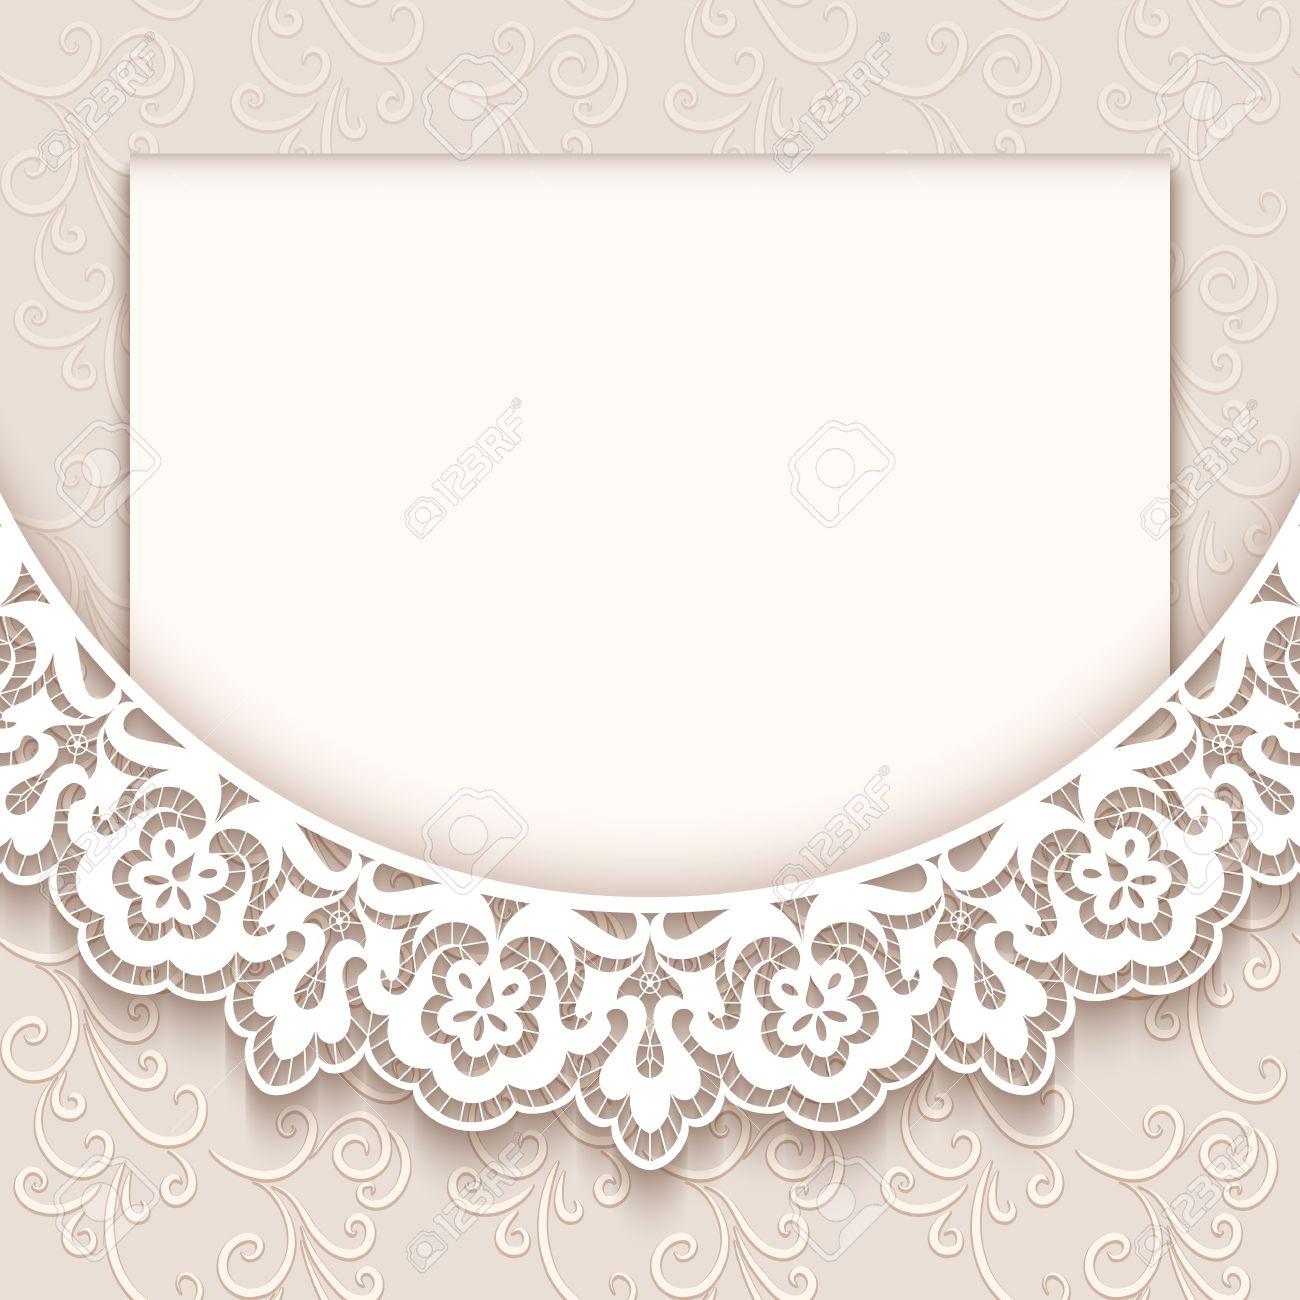 Elegant Greeting Card With Lace Decoration, Vintage Wedding ...